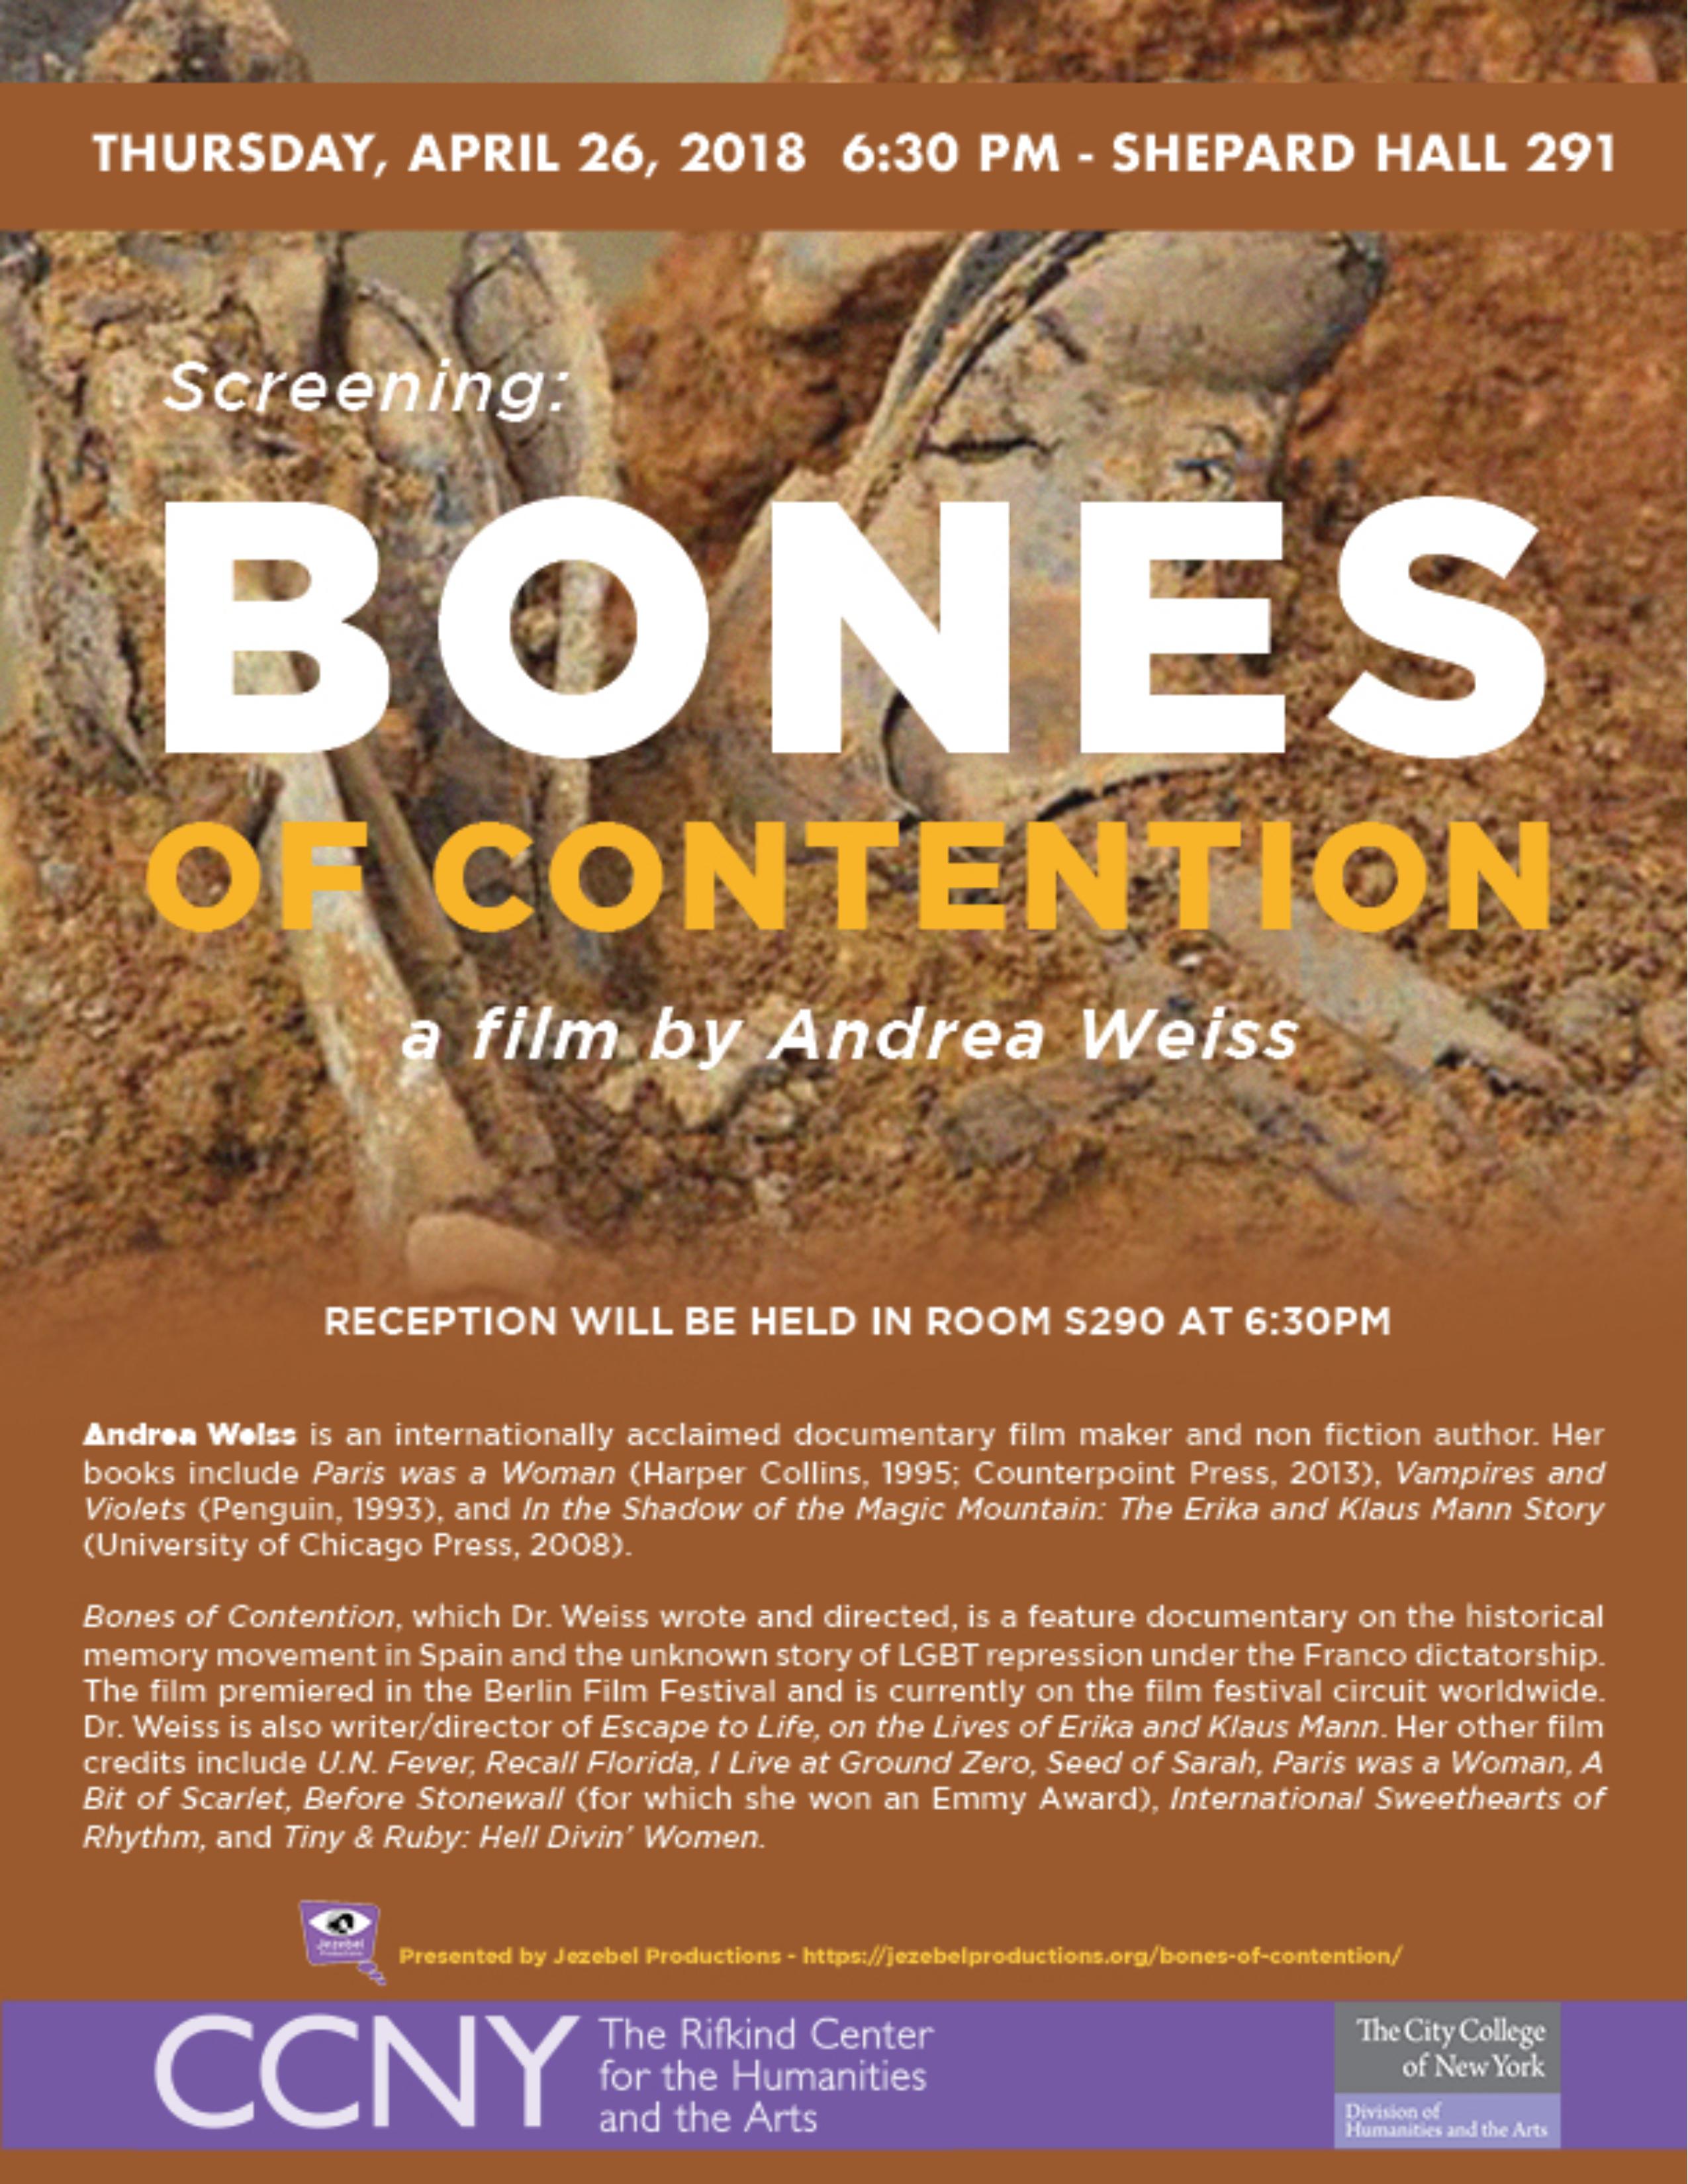 Bones of Contention Screening - April 26, 2018